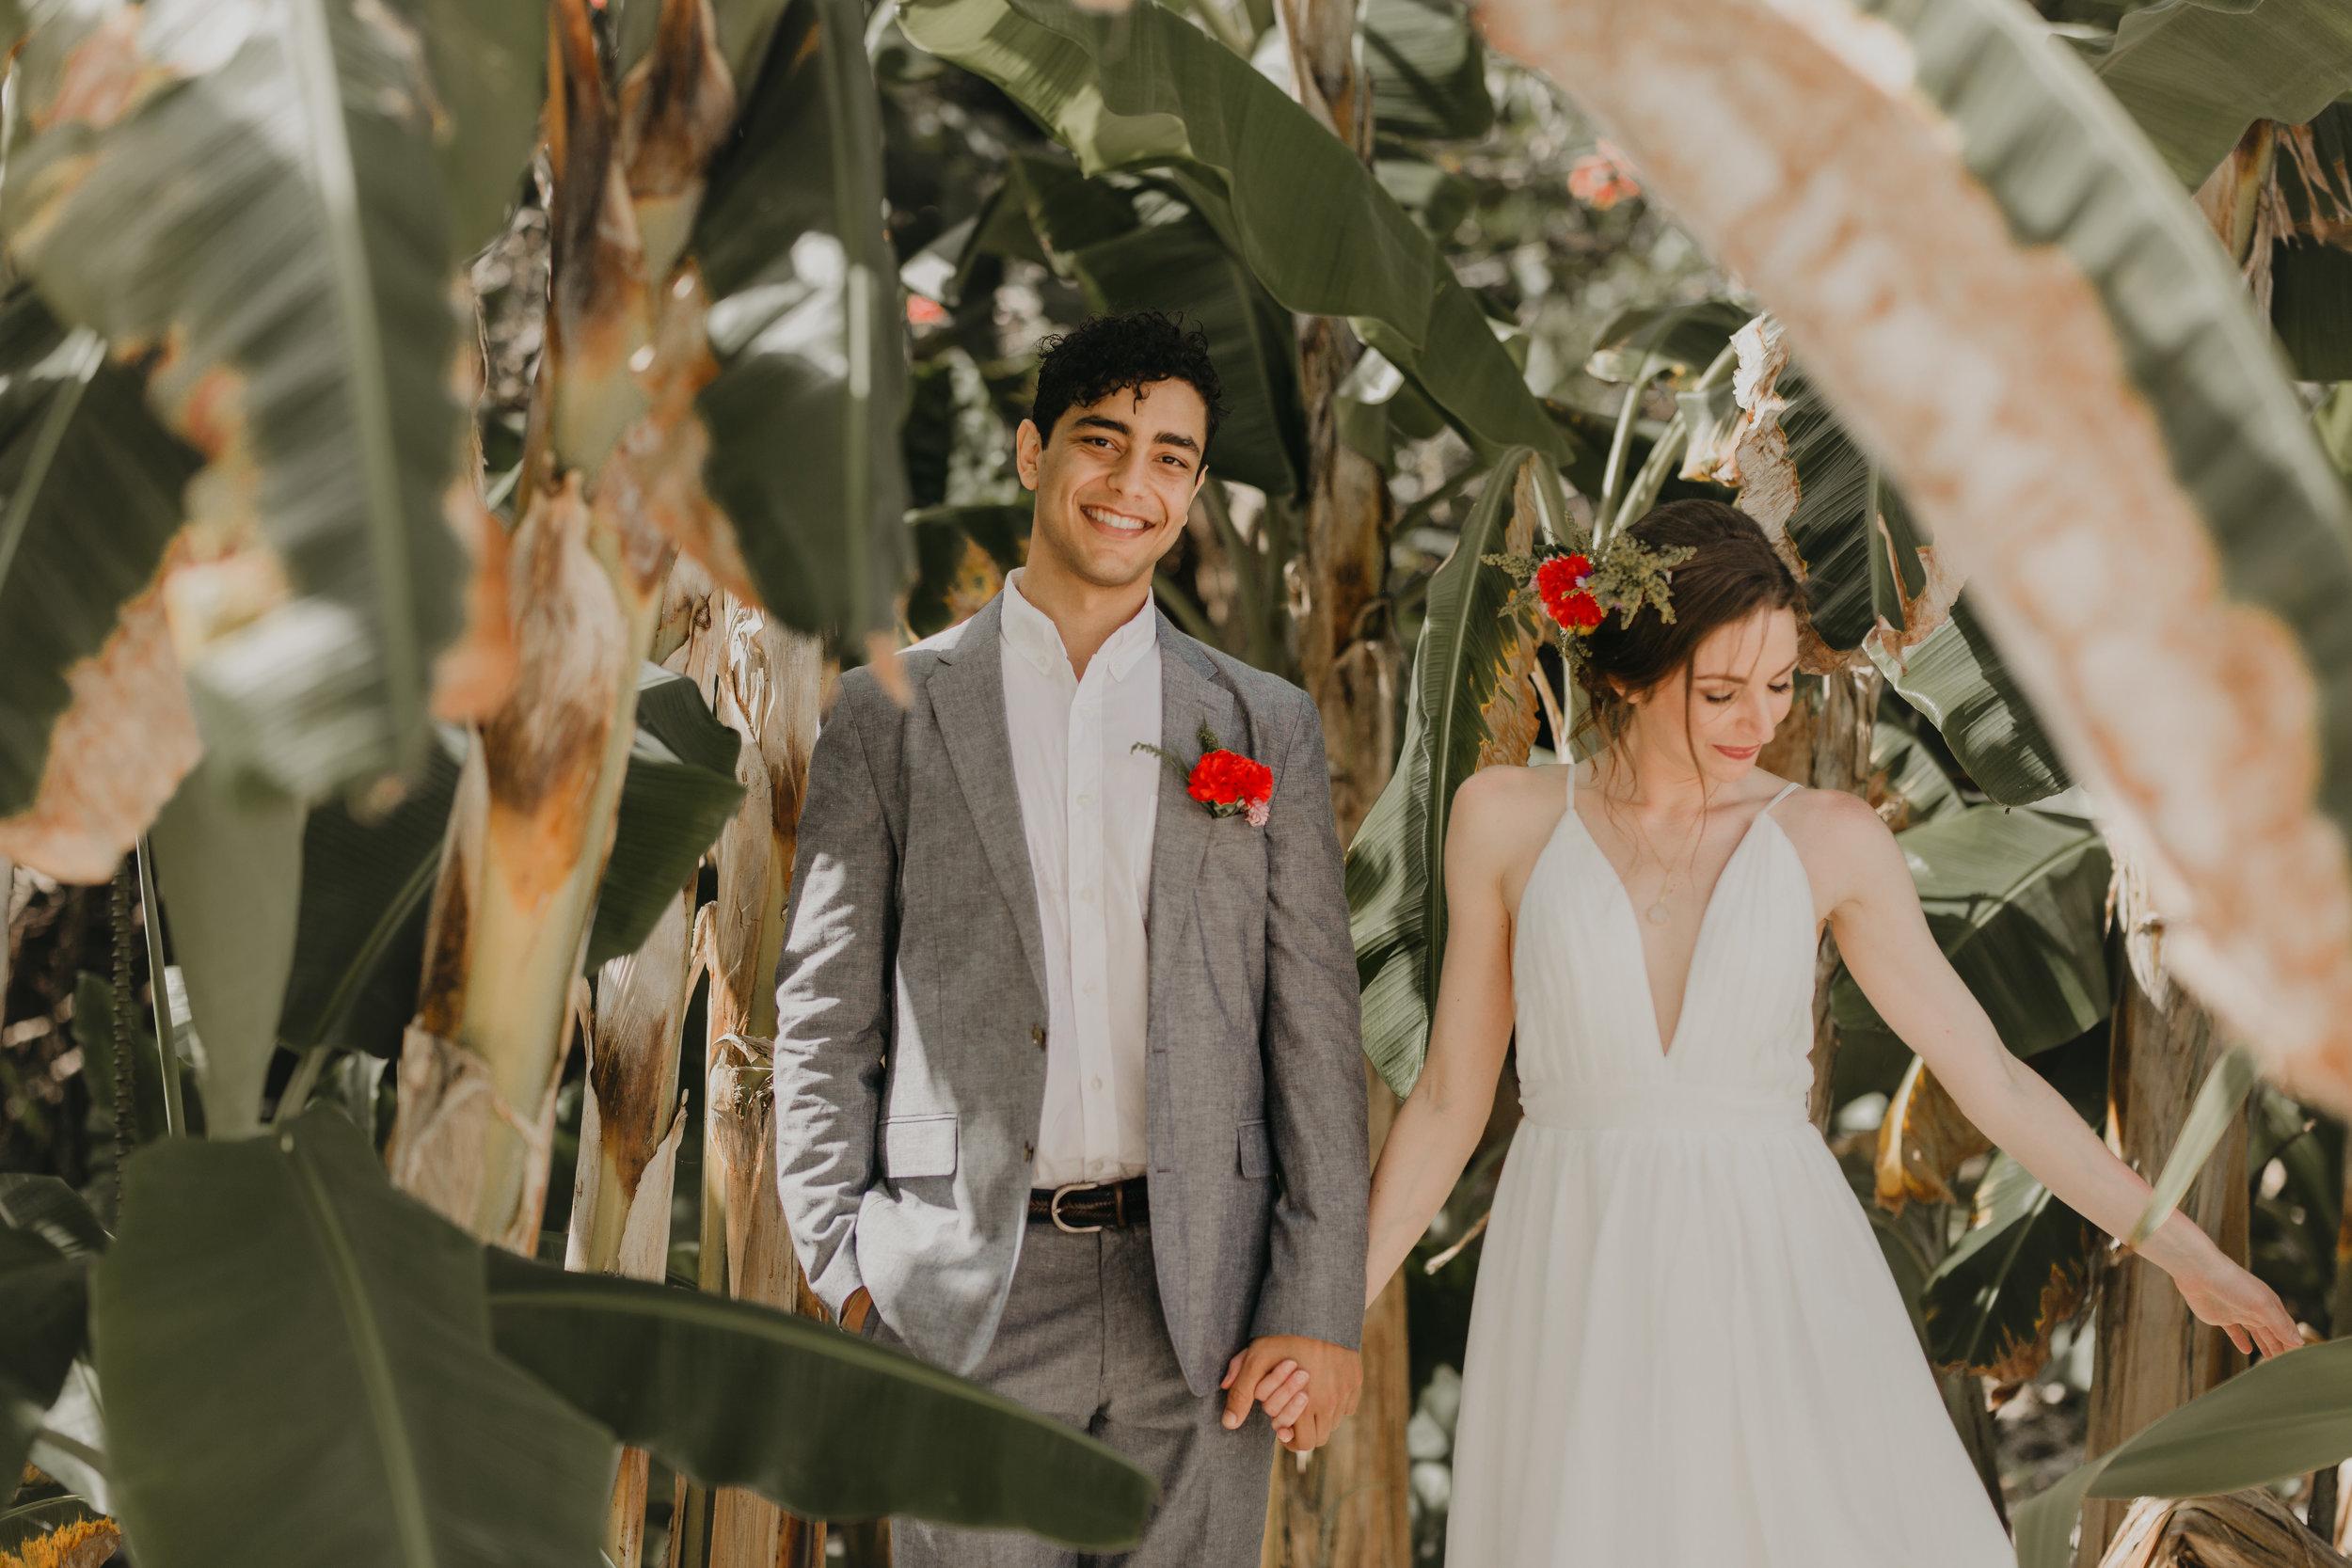 Nicole-Daacke-Photography-beachfront-akumal-destionation-wedding-tulum-mexico-elopement-photographer-destination-wedding-inspiration-sunset-champagne-pop-boho-bride-ocean-tropical-bohemian-tulum-wedding-photos-111.jpg